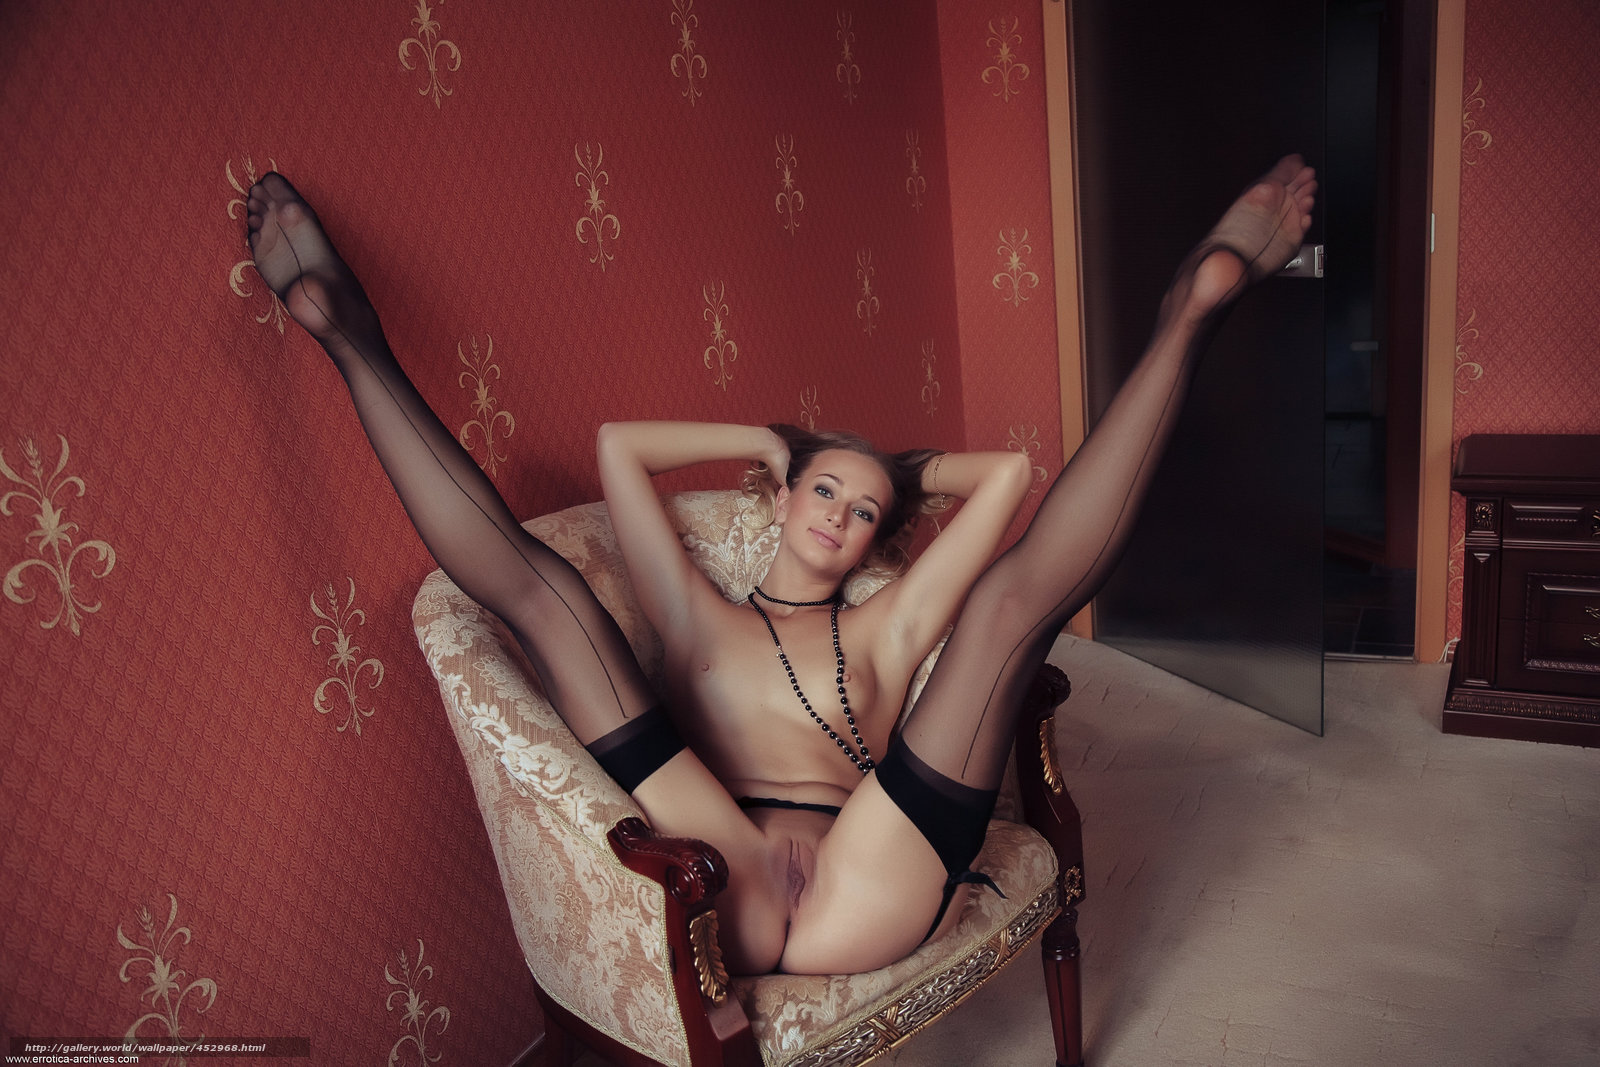 Фото галерея еро девушек в чулках 16 фотография